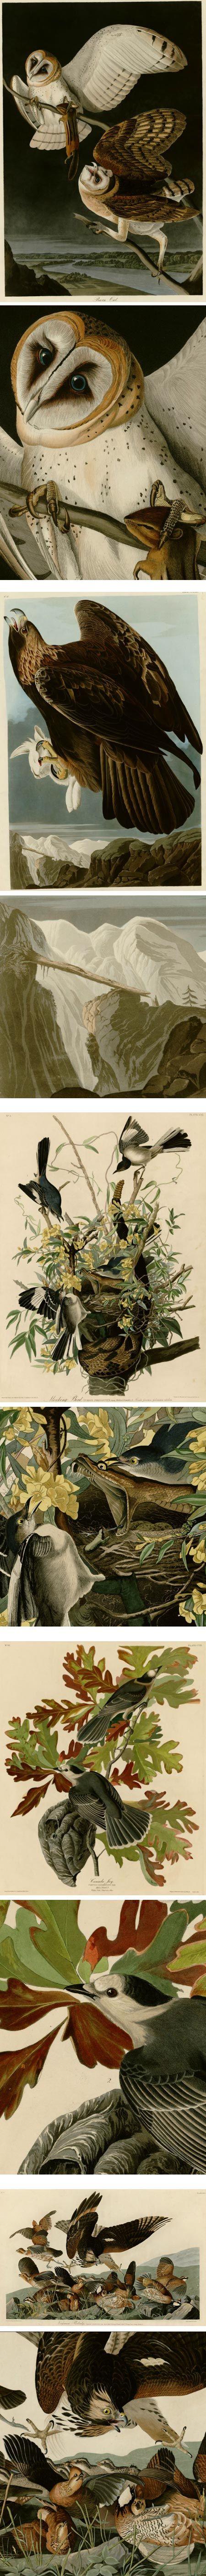 John James Audubon, Birds of America